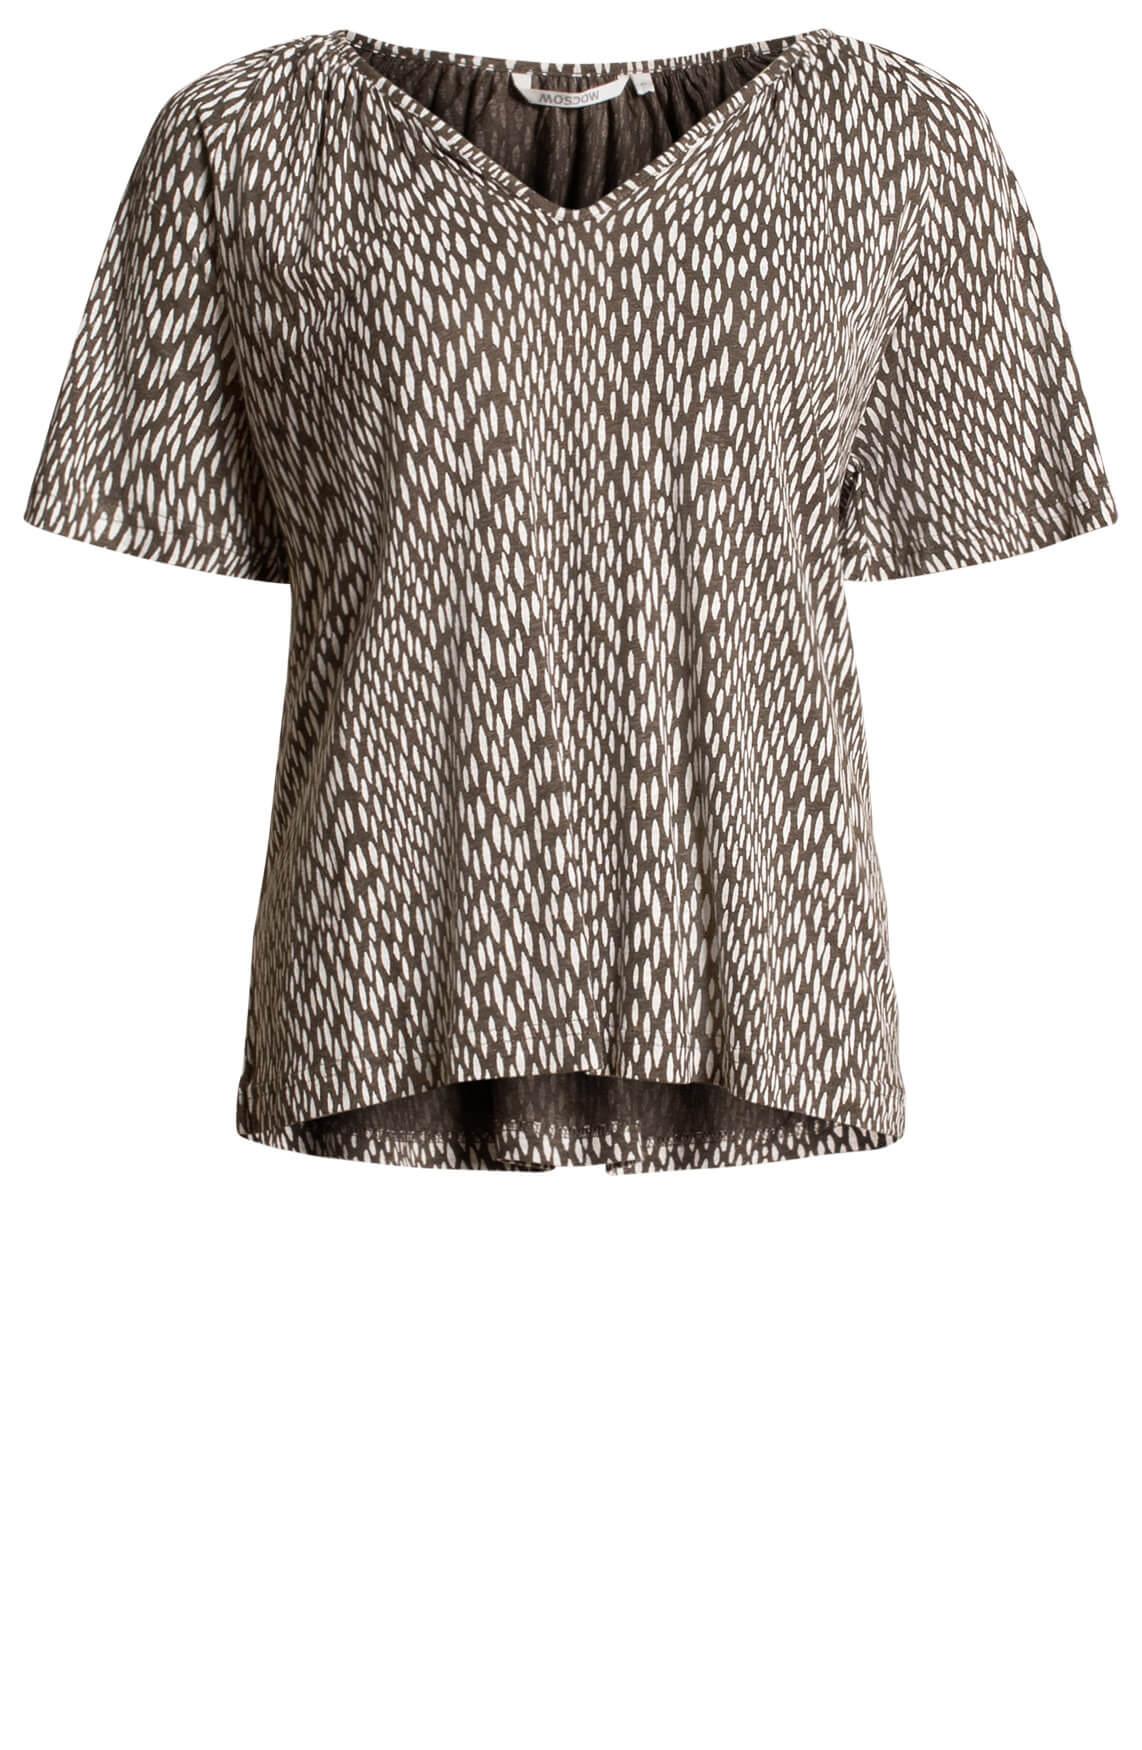 Moscow Dames Shirt met print groen